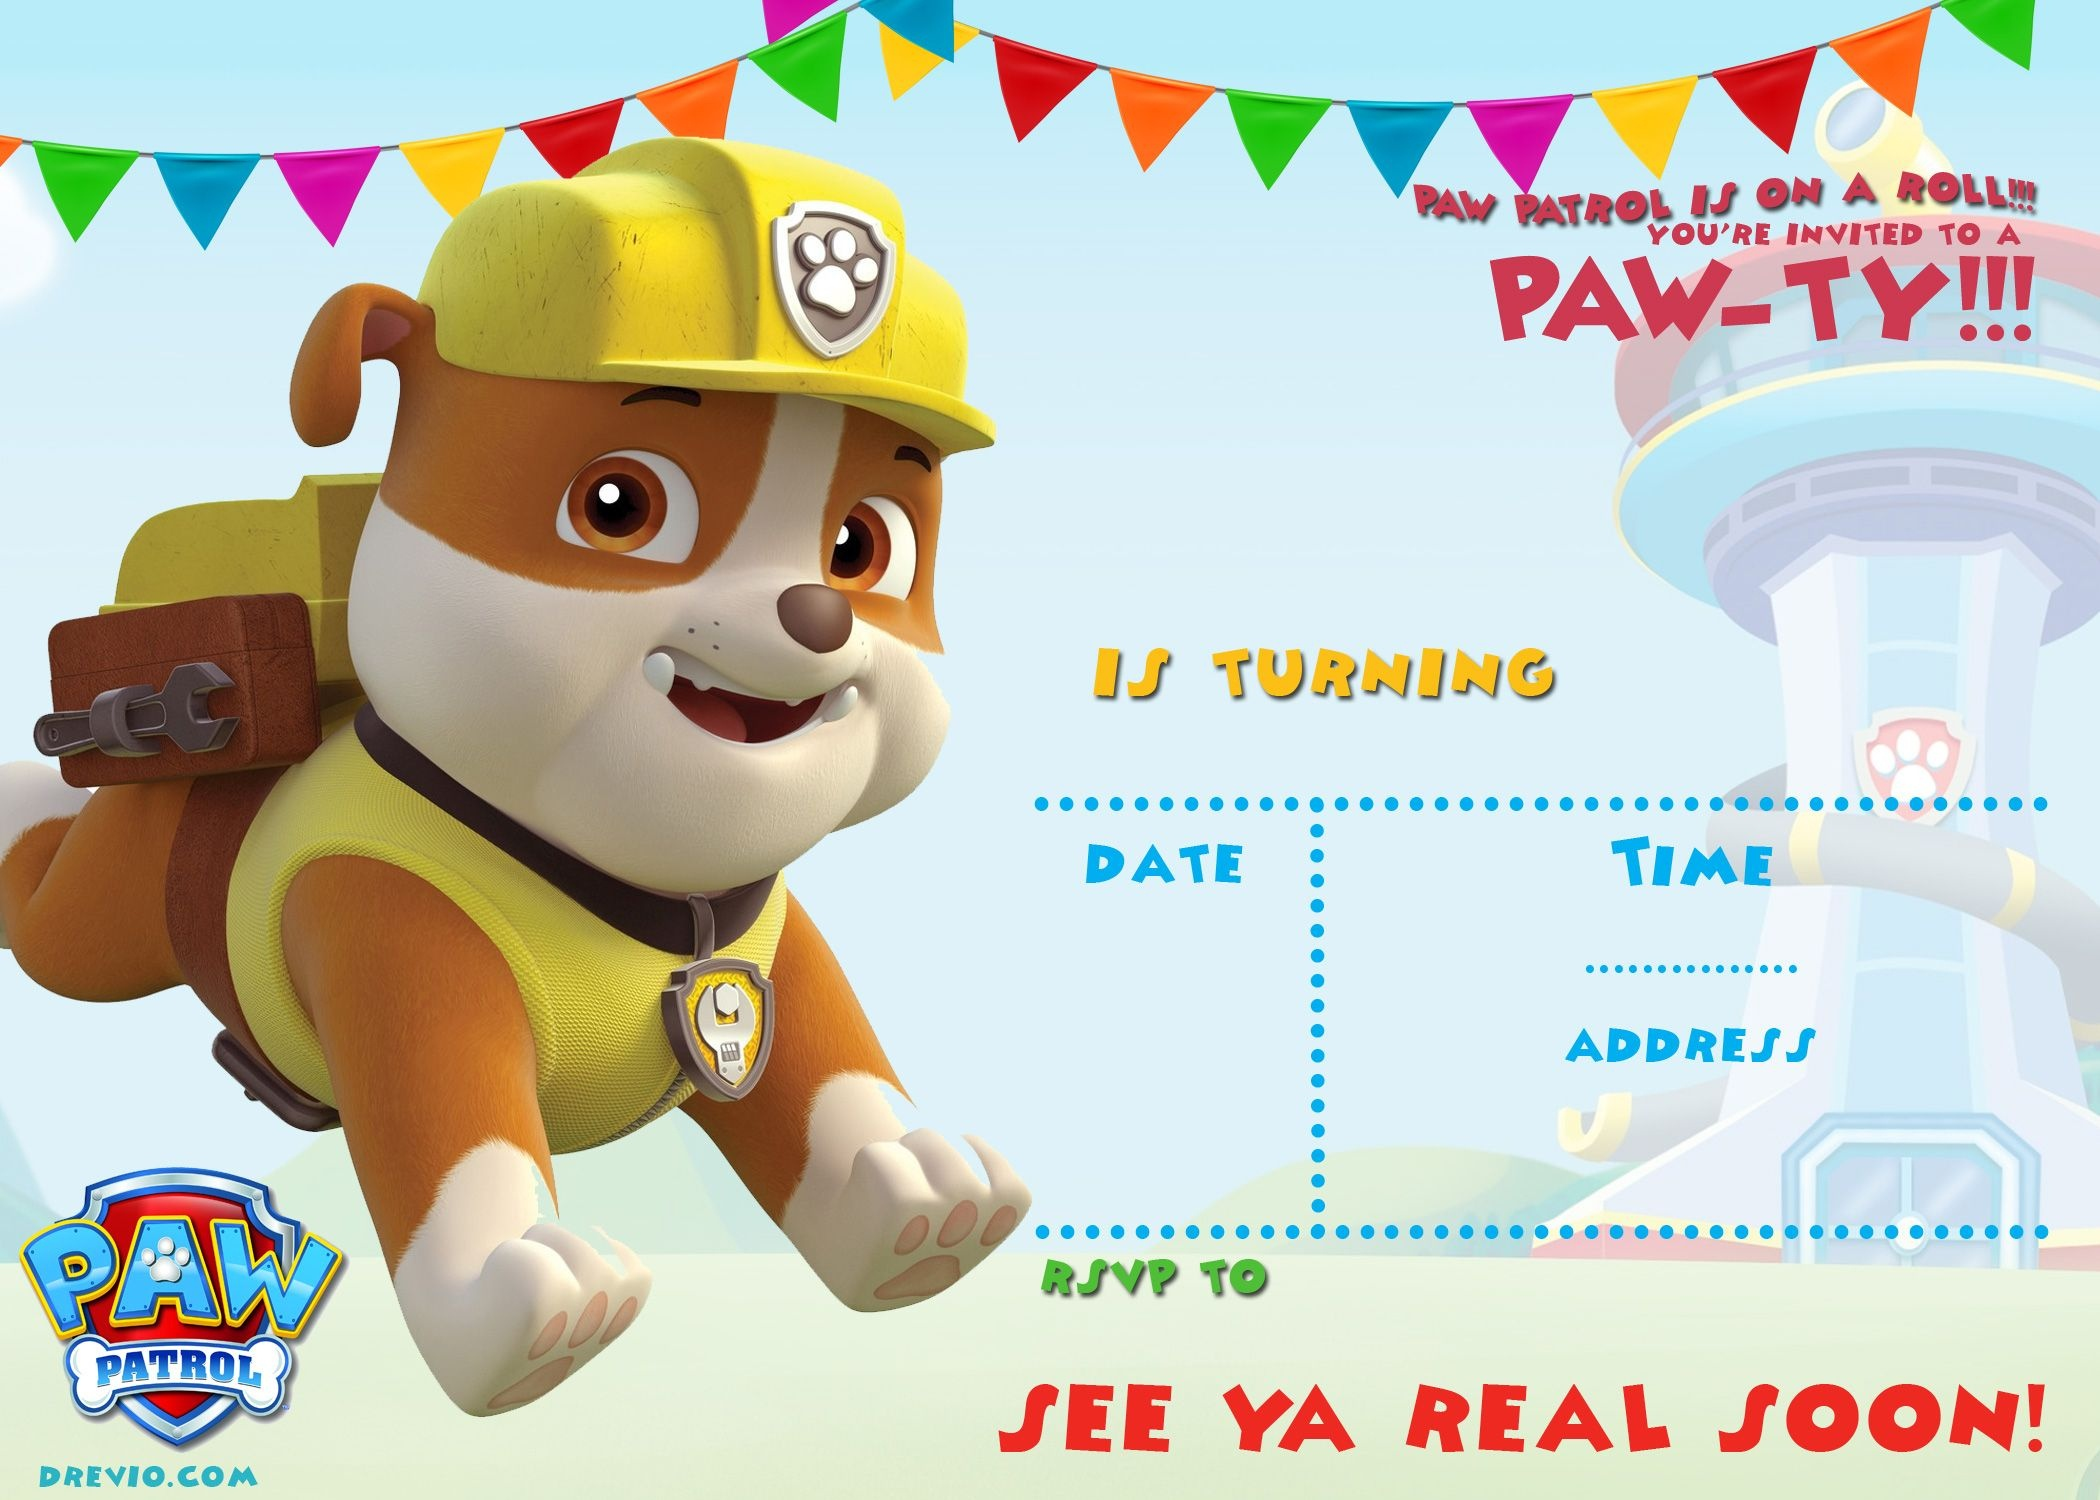 Free Printable Paw Patrol Invitation Template - All Characters - Paw Patrol Free Printables Invitations